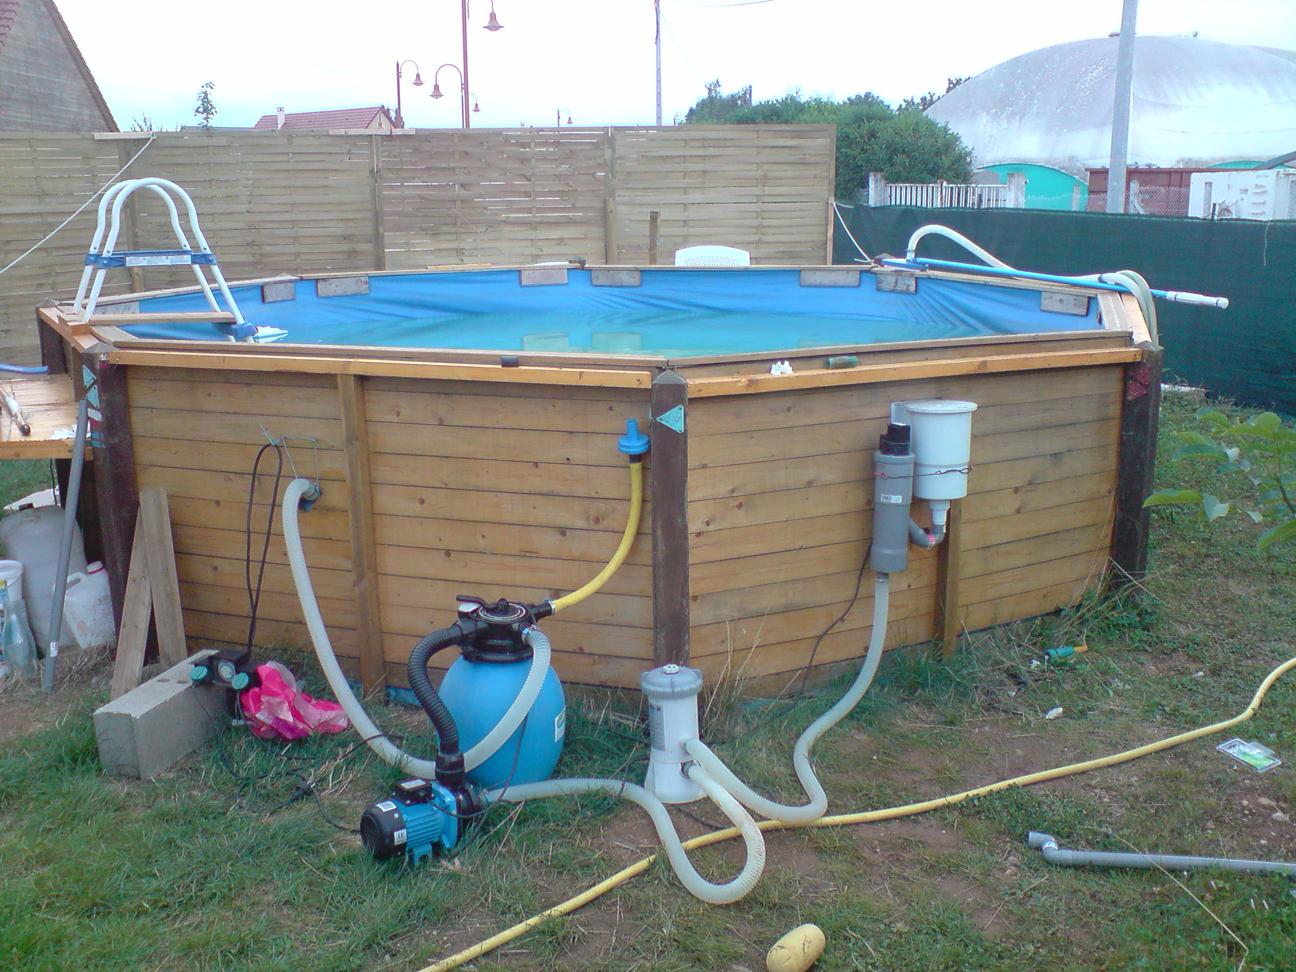 Filtration piscine hors sol - Fonctionnement filtre a sable piscine ...